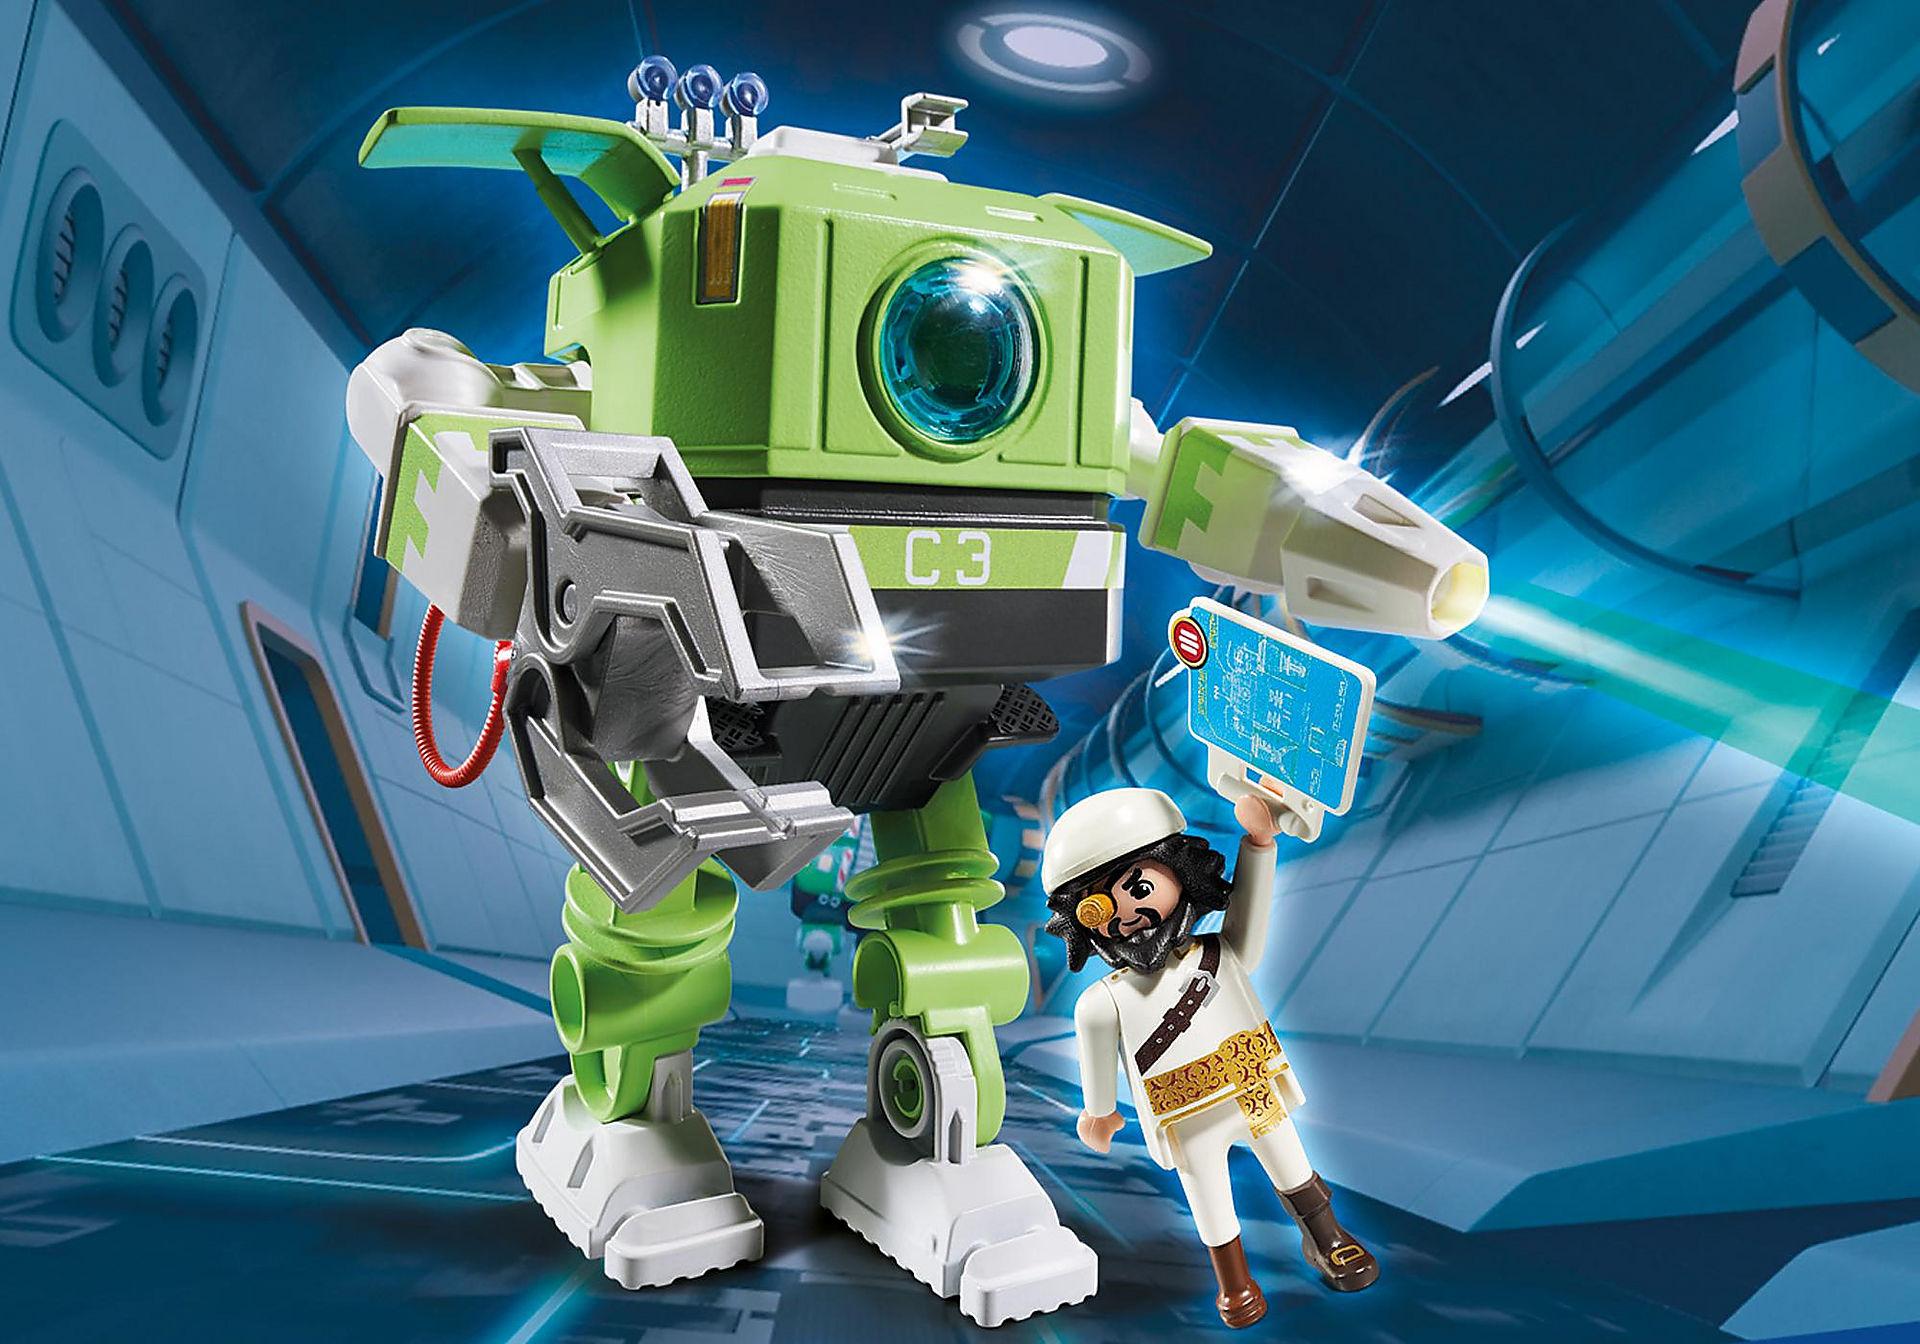 http://media.playmobil.com/i/playmobil/6693_product_detail/Cleano Robot